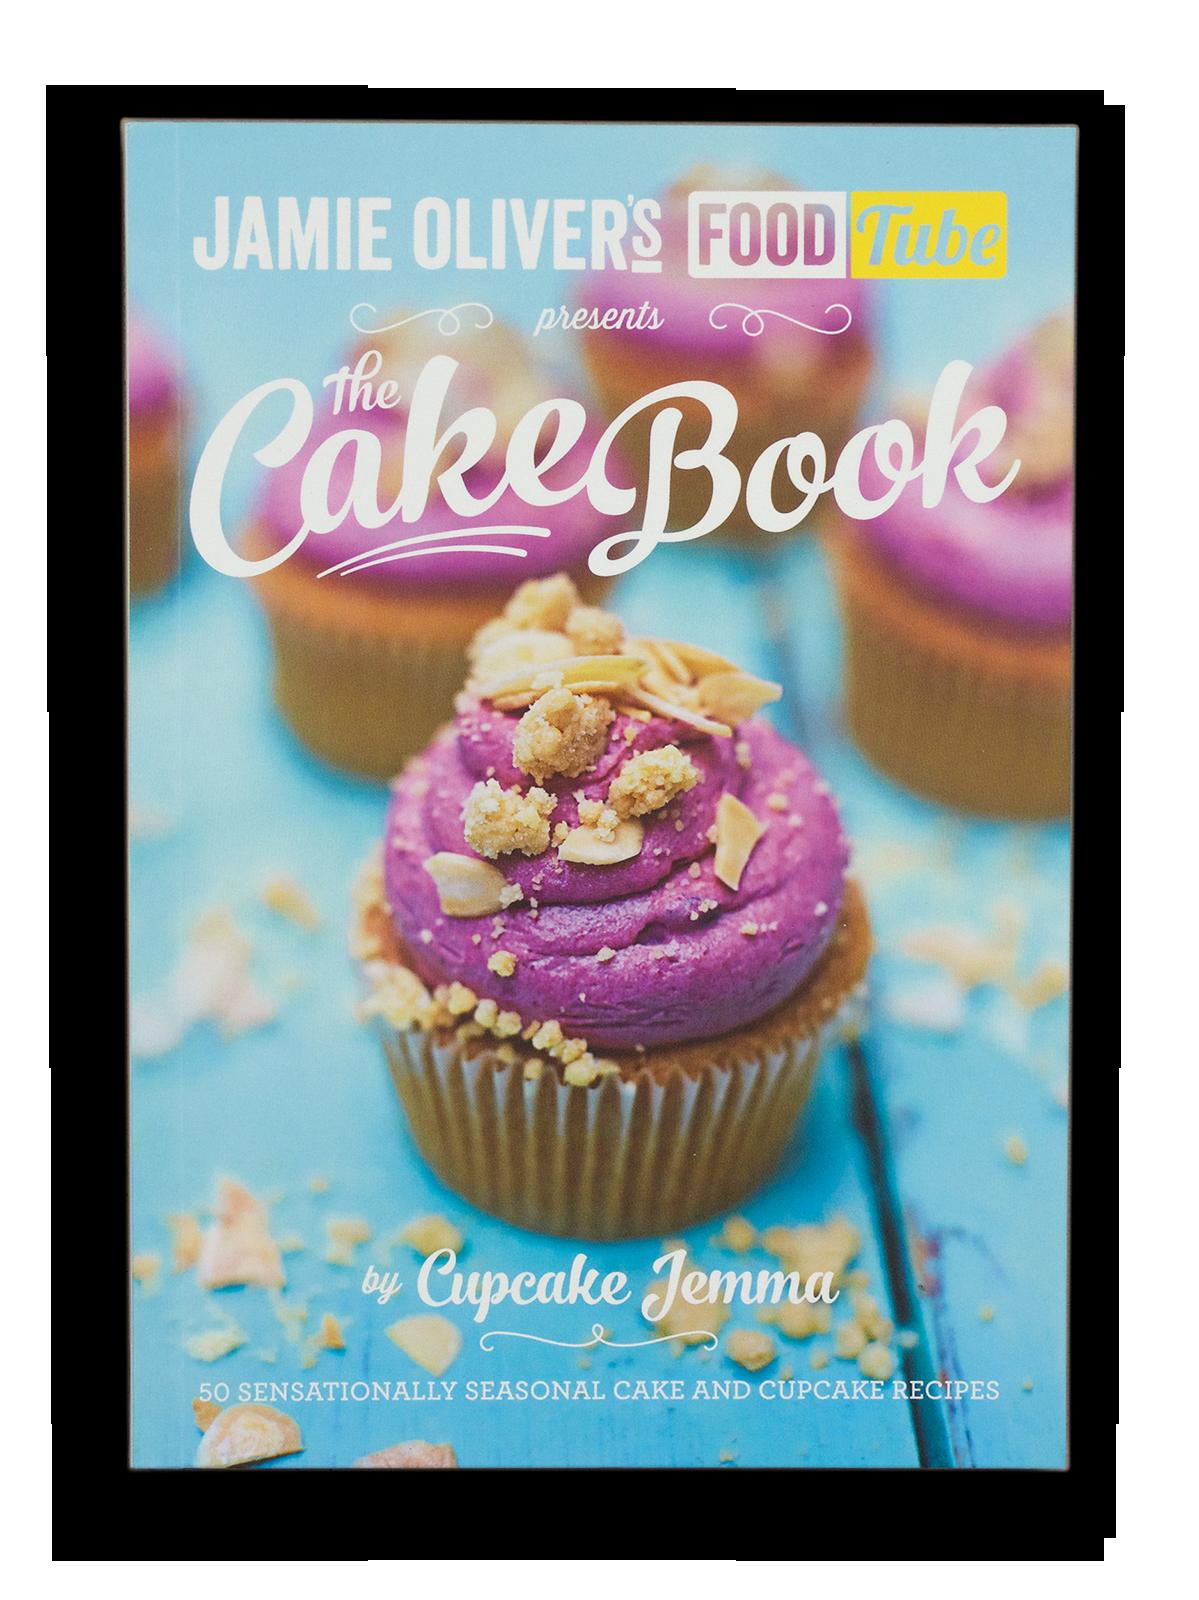 The Cake Book Cupcake Jemma Cupcake Jemma Seasonal Baking